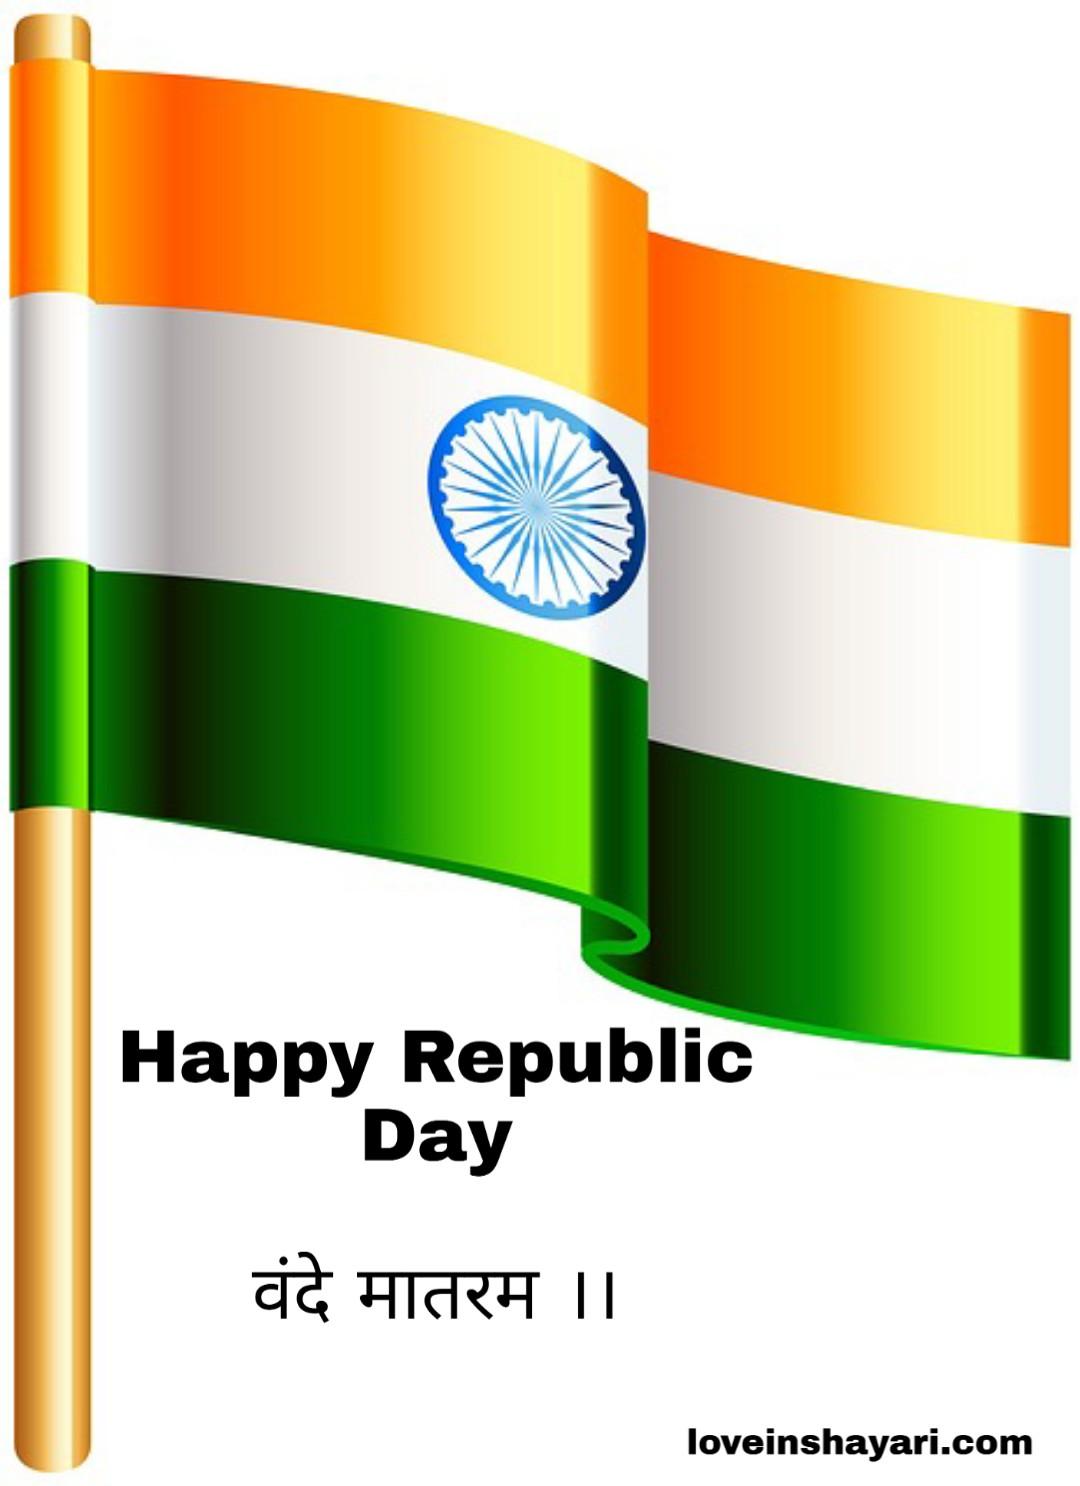 Happy Republic Day shayari 2020 with images